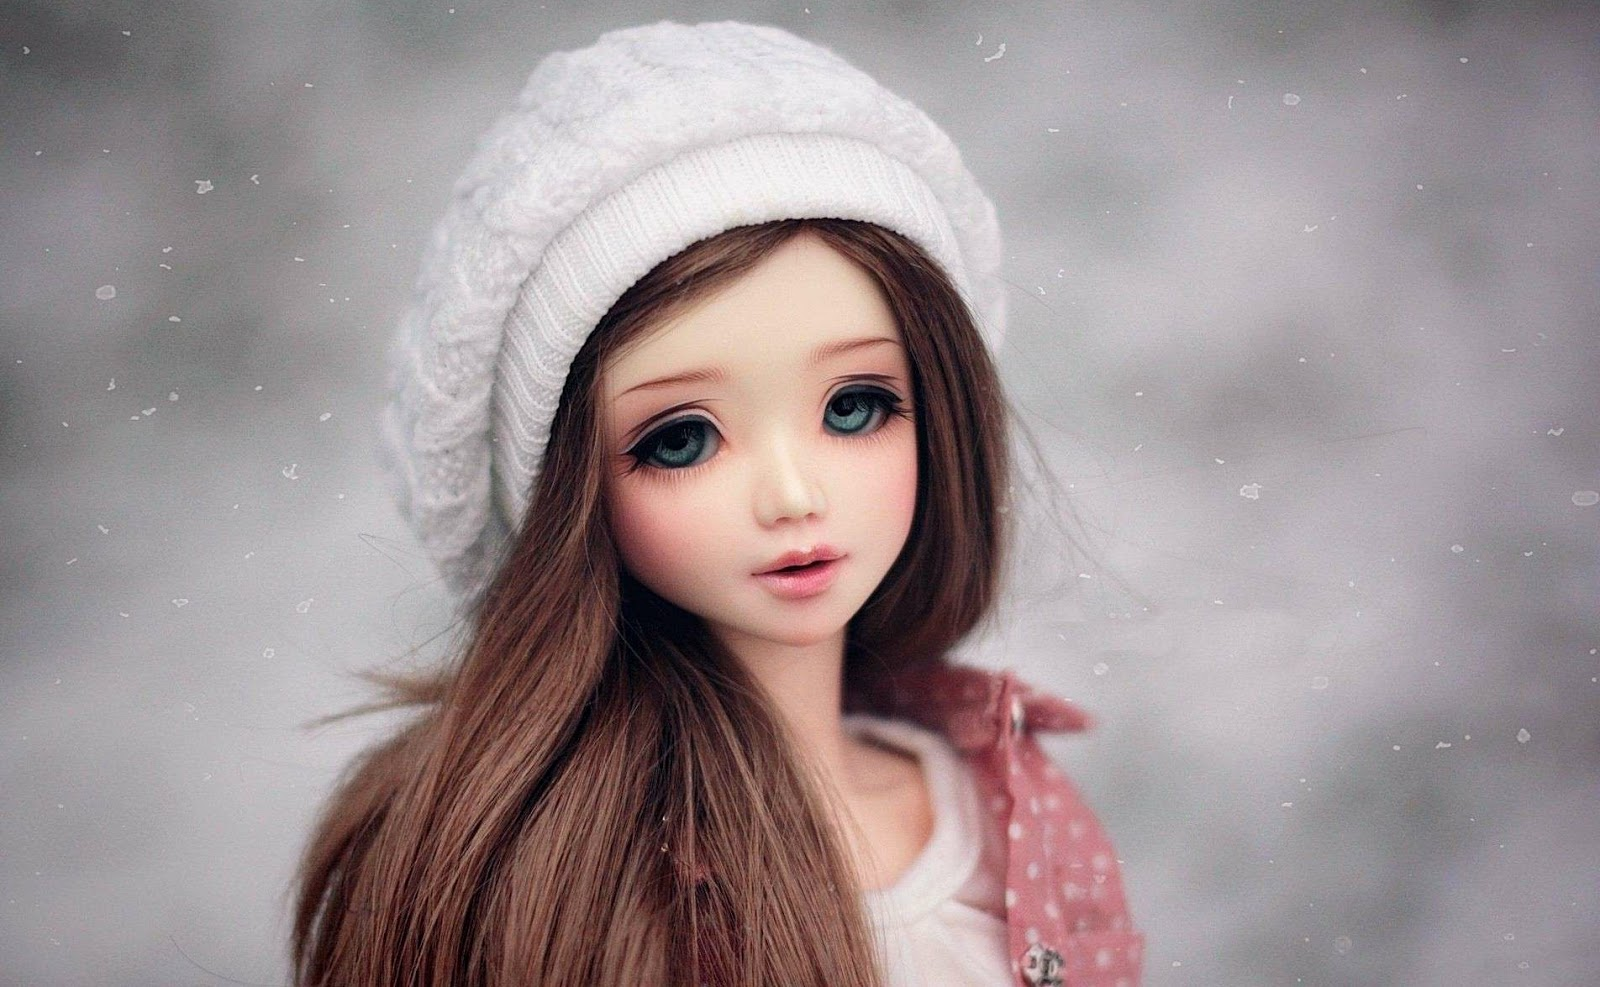 Kumpulan Gambar Wallpaper Barbie Bilik Wallpaper